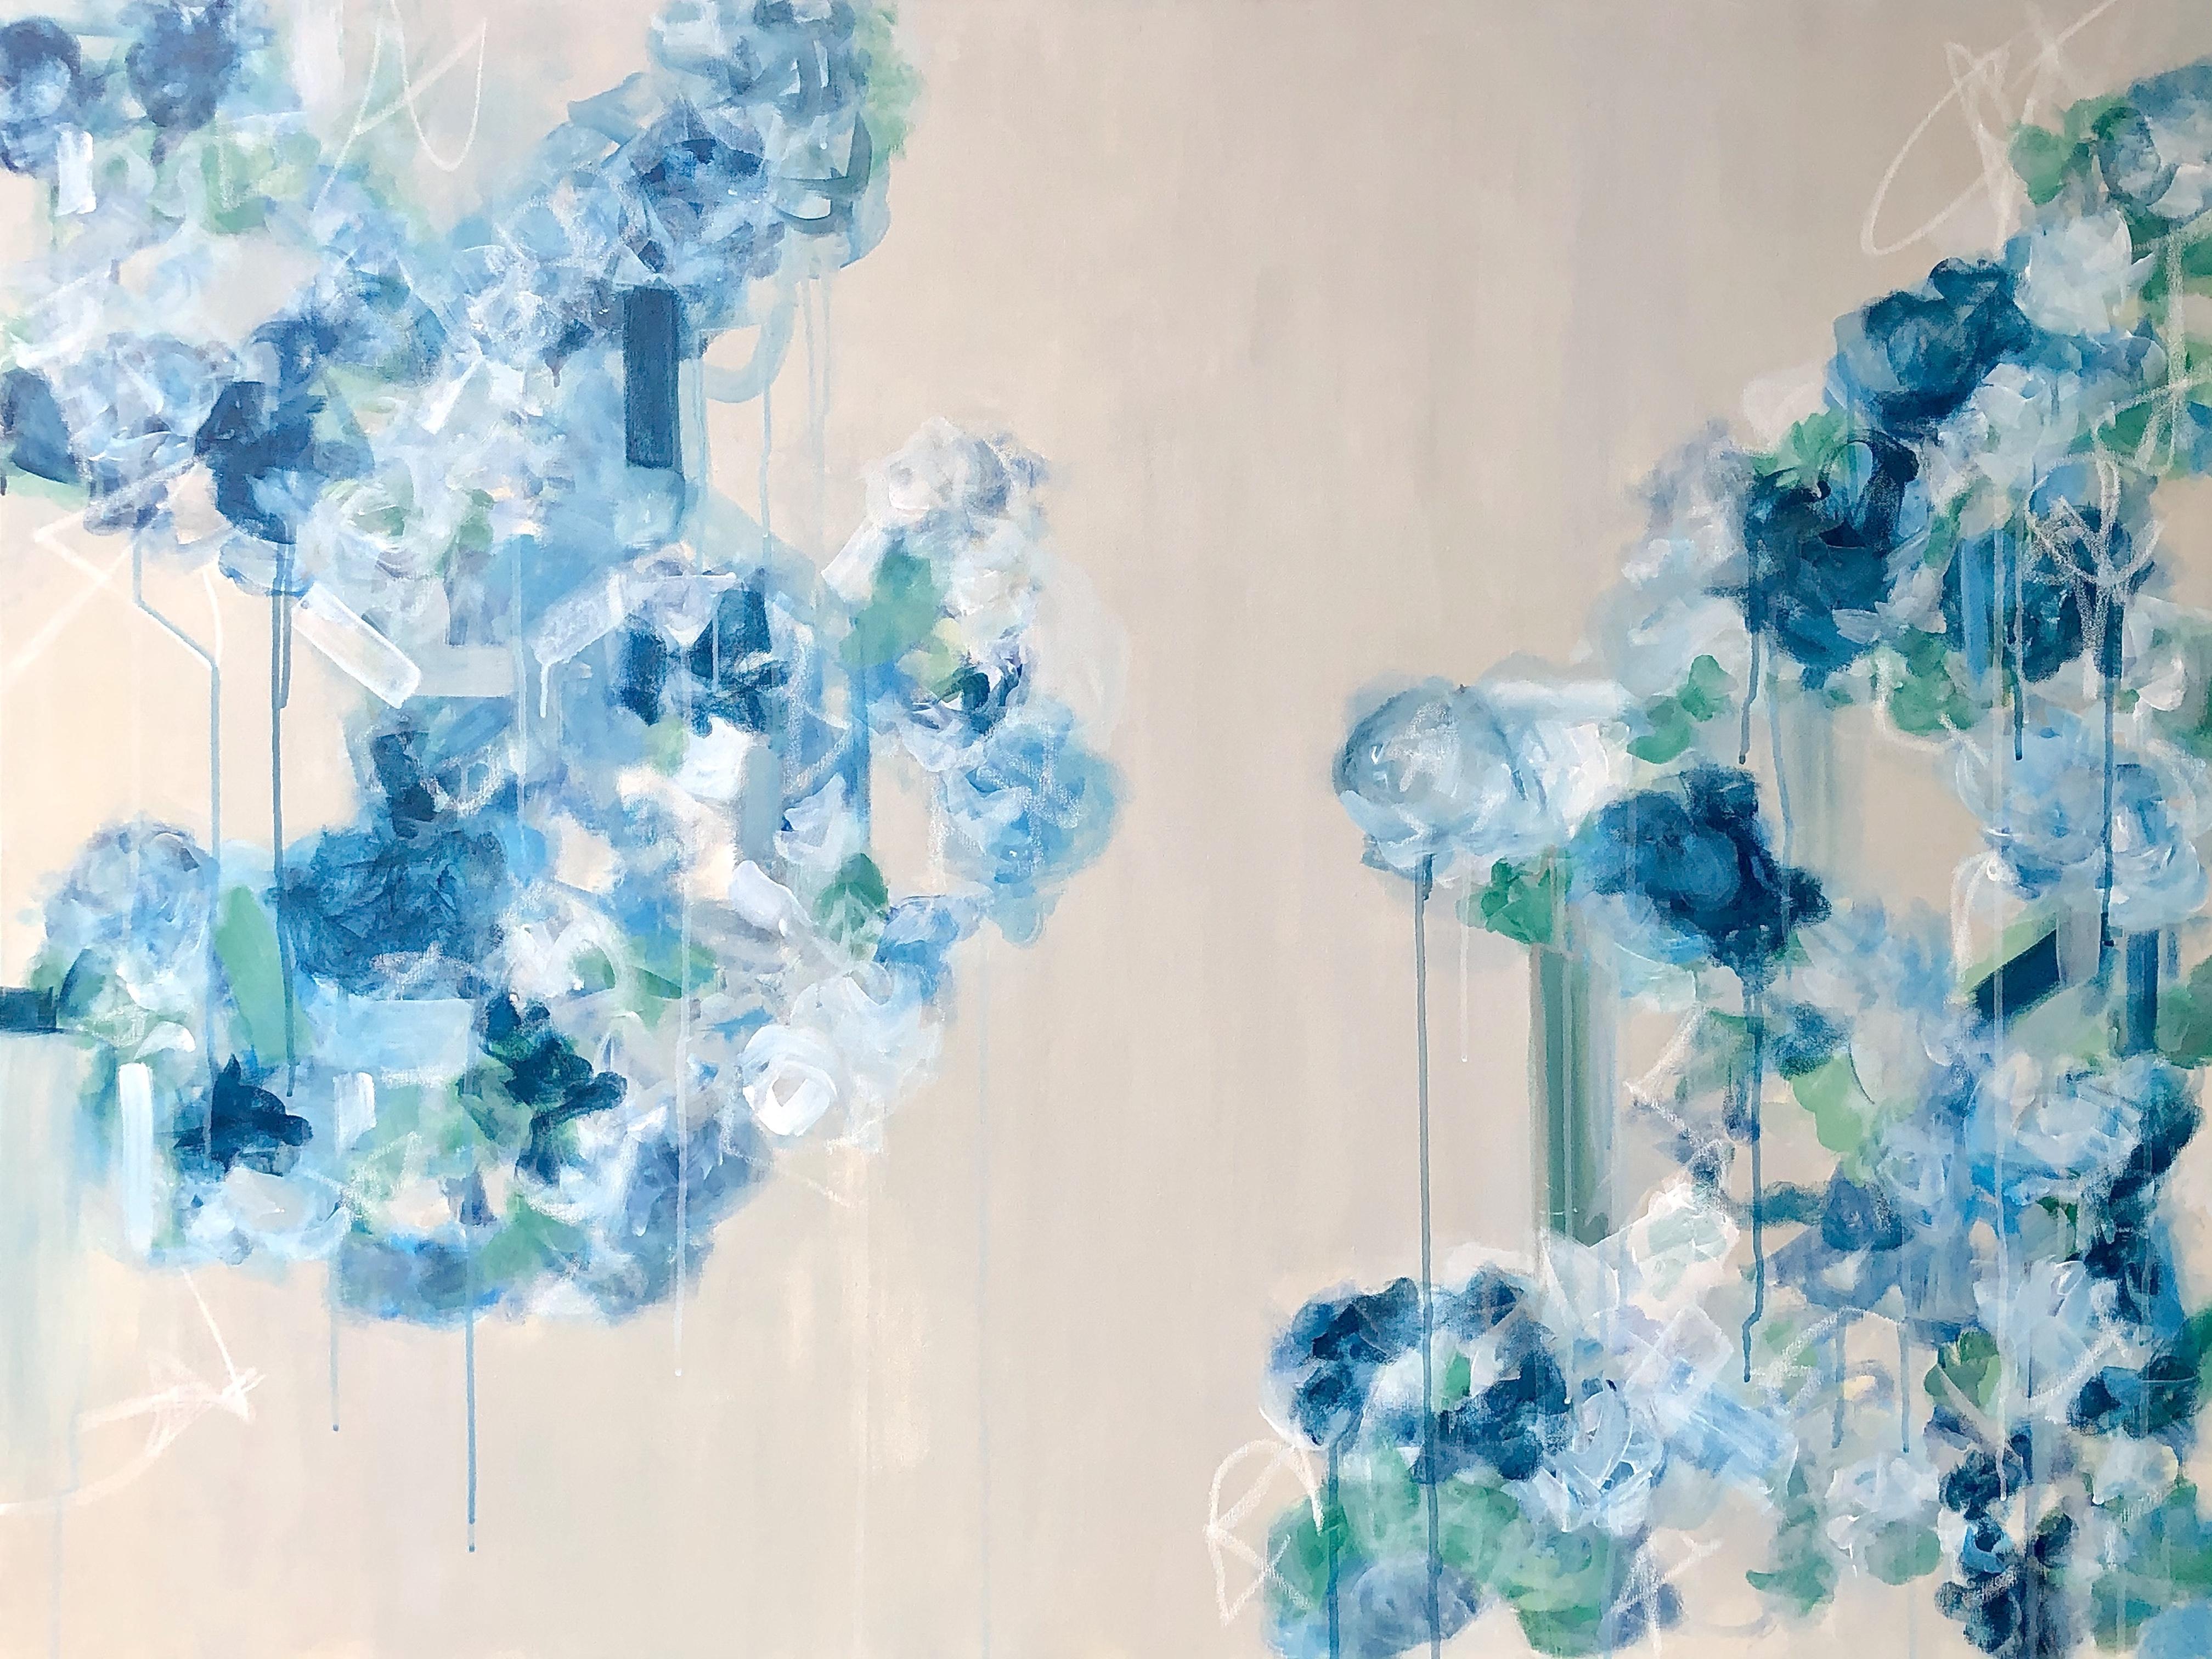 Tranquility by Stefanie Stark